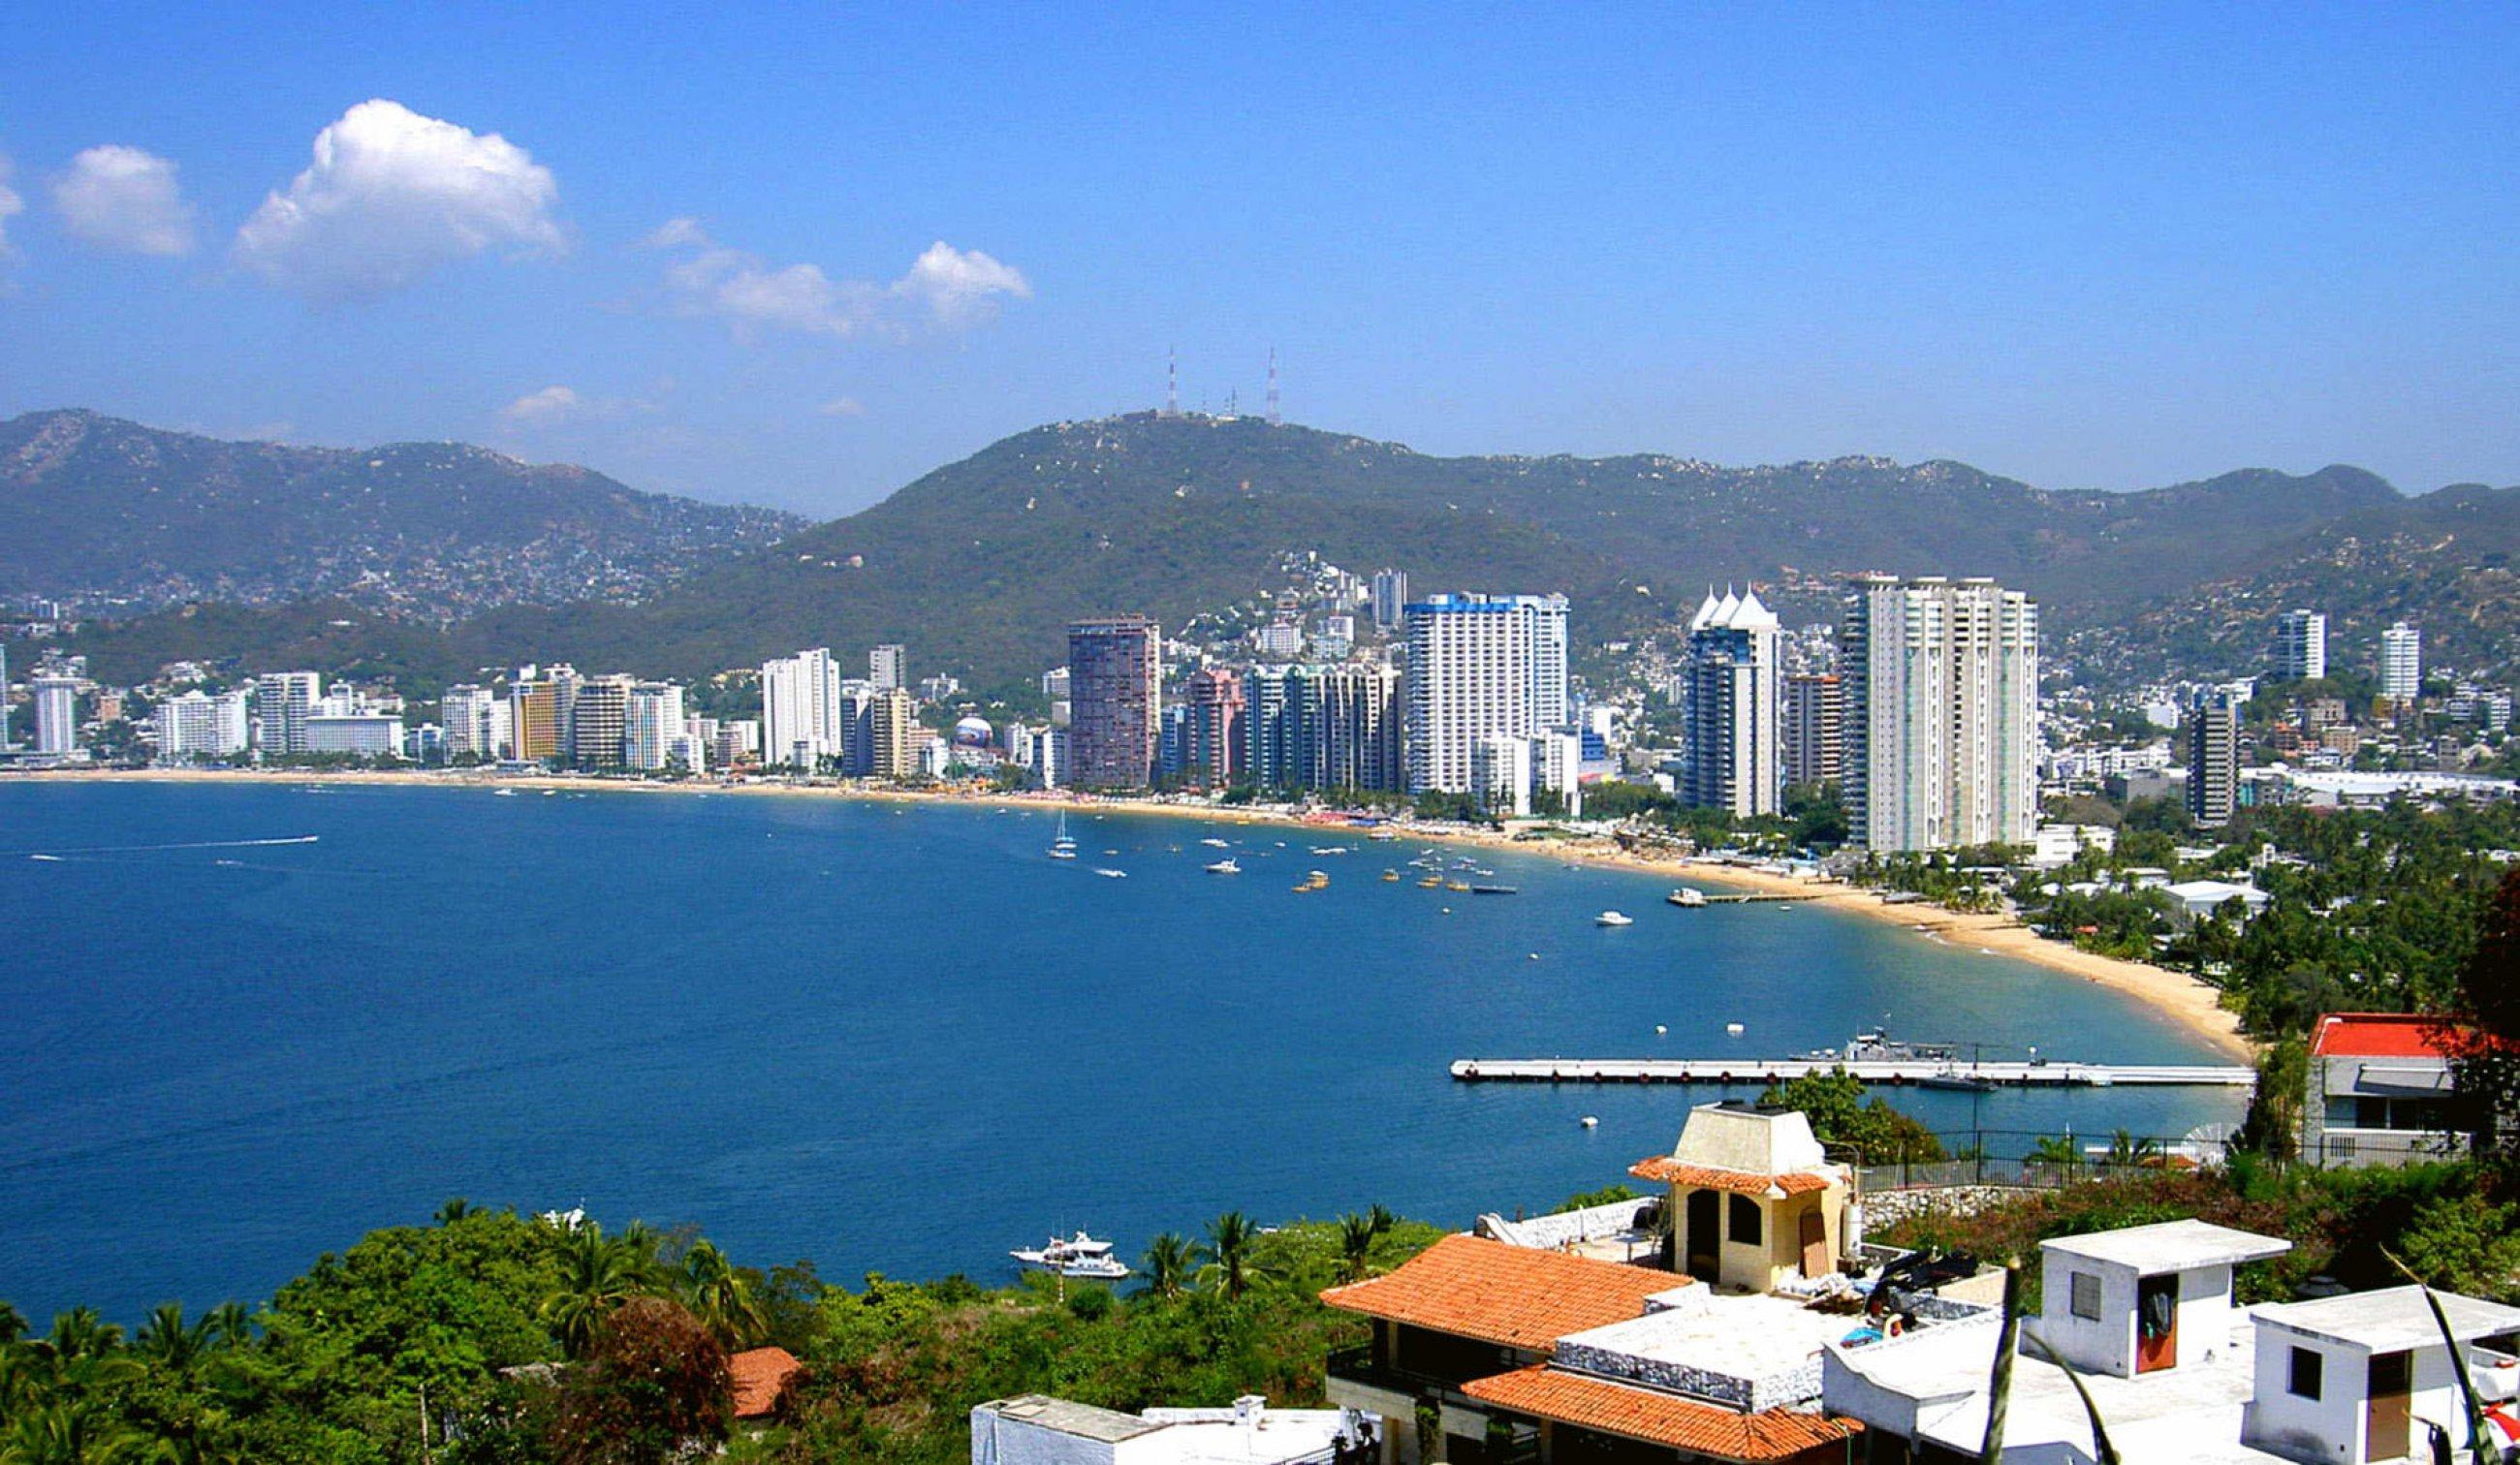 https://bubo.sk/uploads/galleries/5010/promotour-bahia-de-acapulco.jpeg